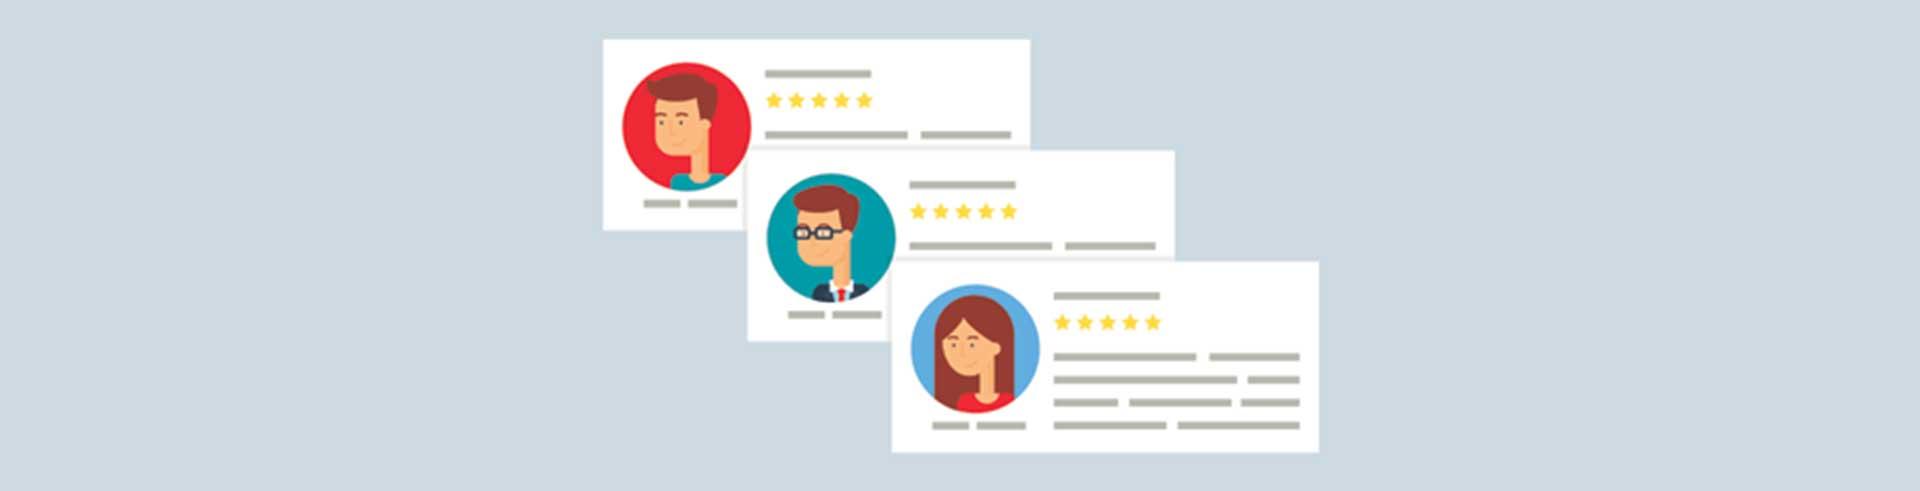 Website Client testimonials